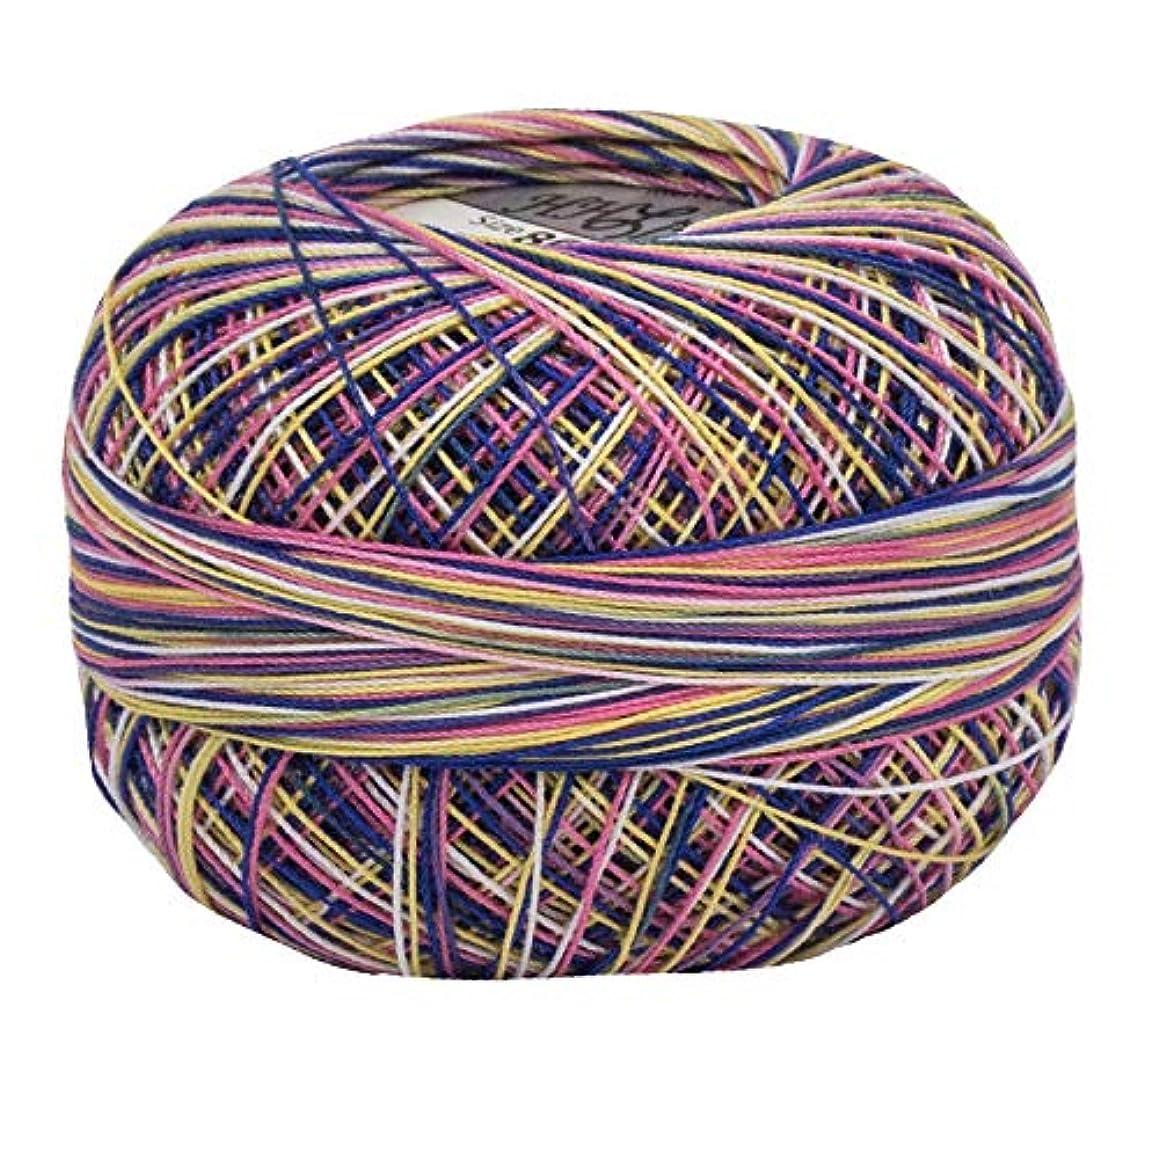 Lizbeth Size 80 HH80 Lizbeth Cotton Thread 184 yds 10 Grams, Tutti Fruitti